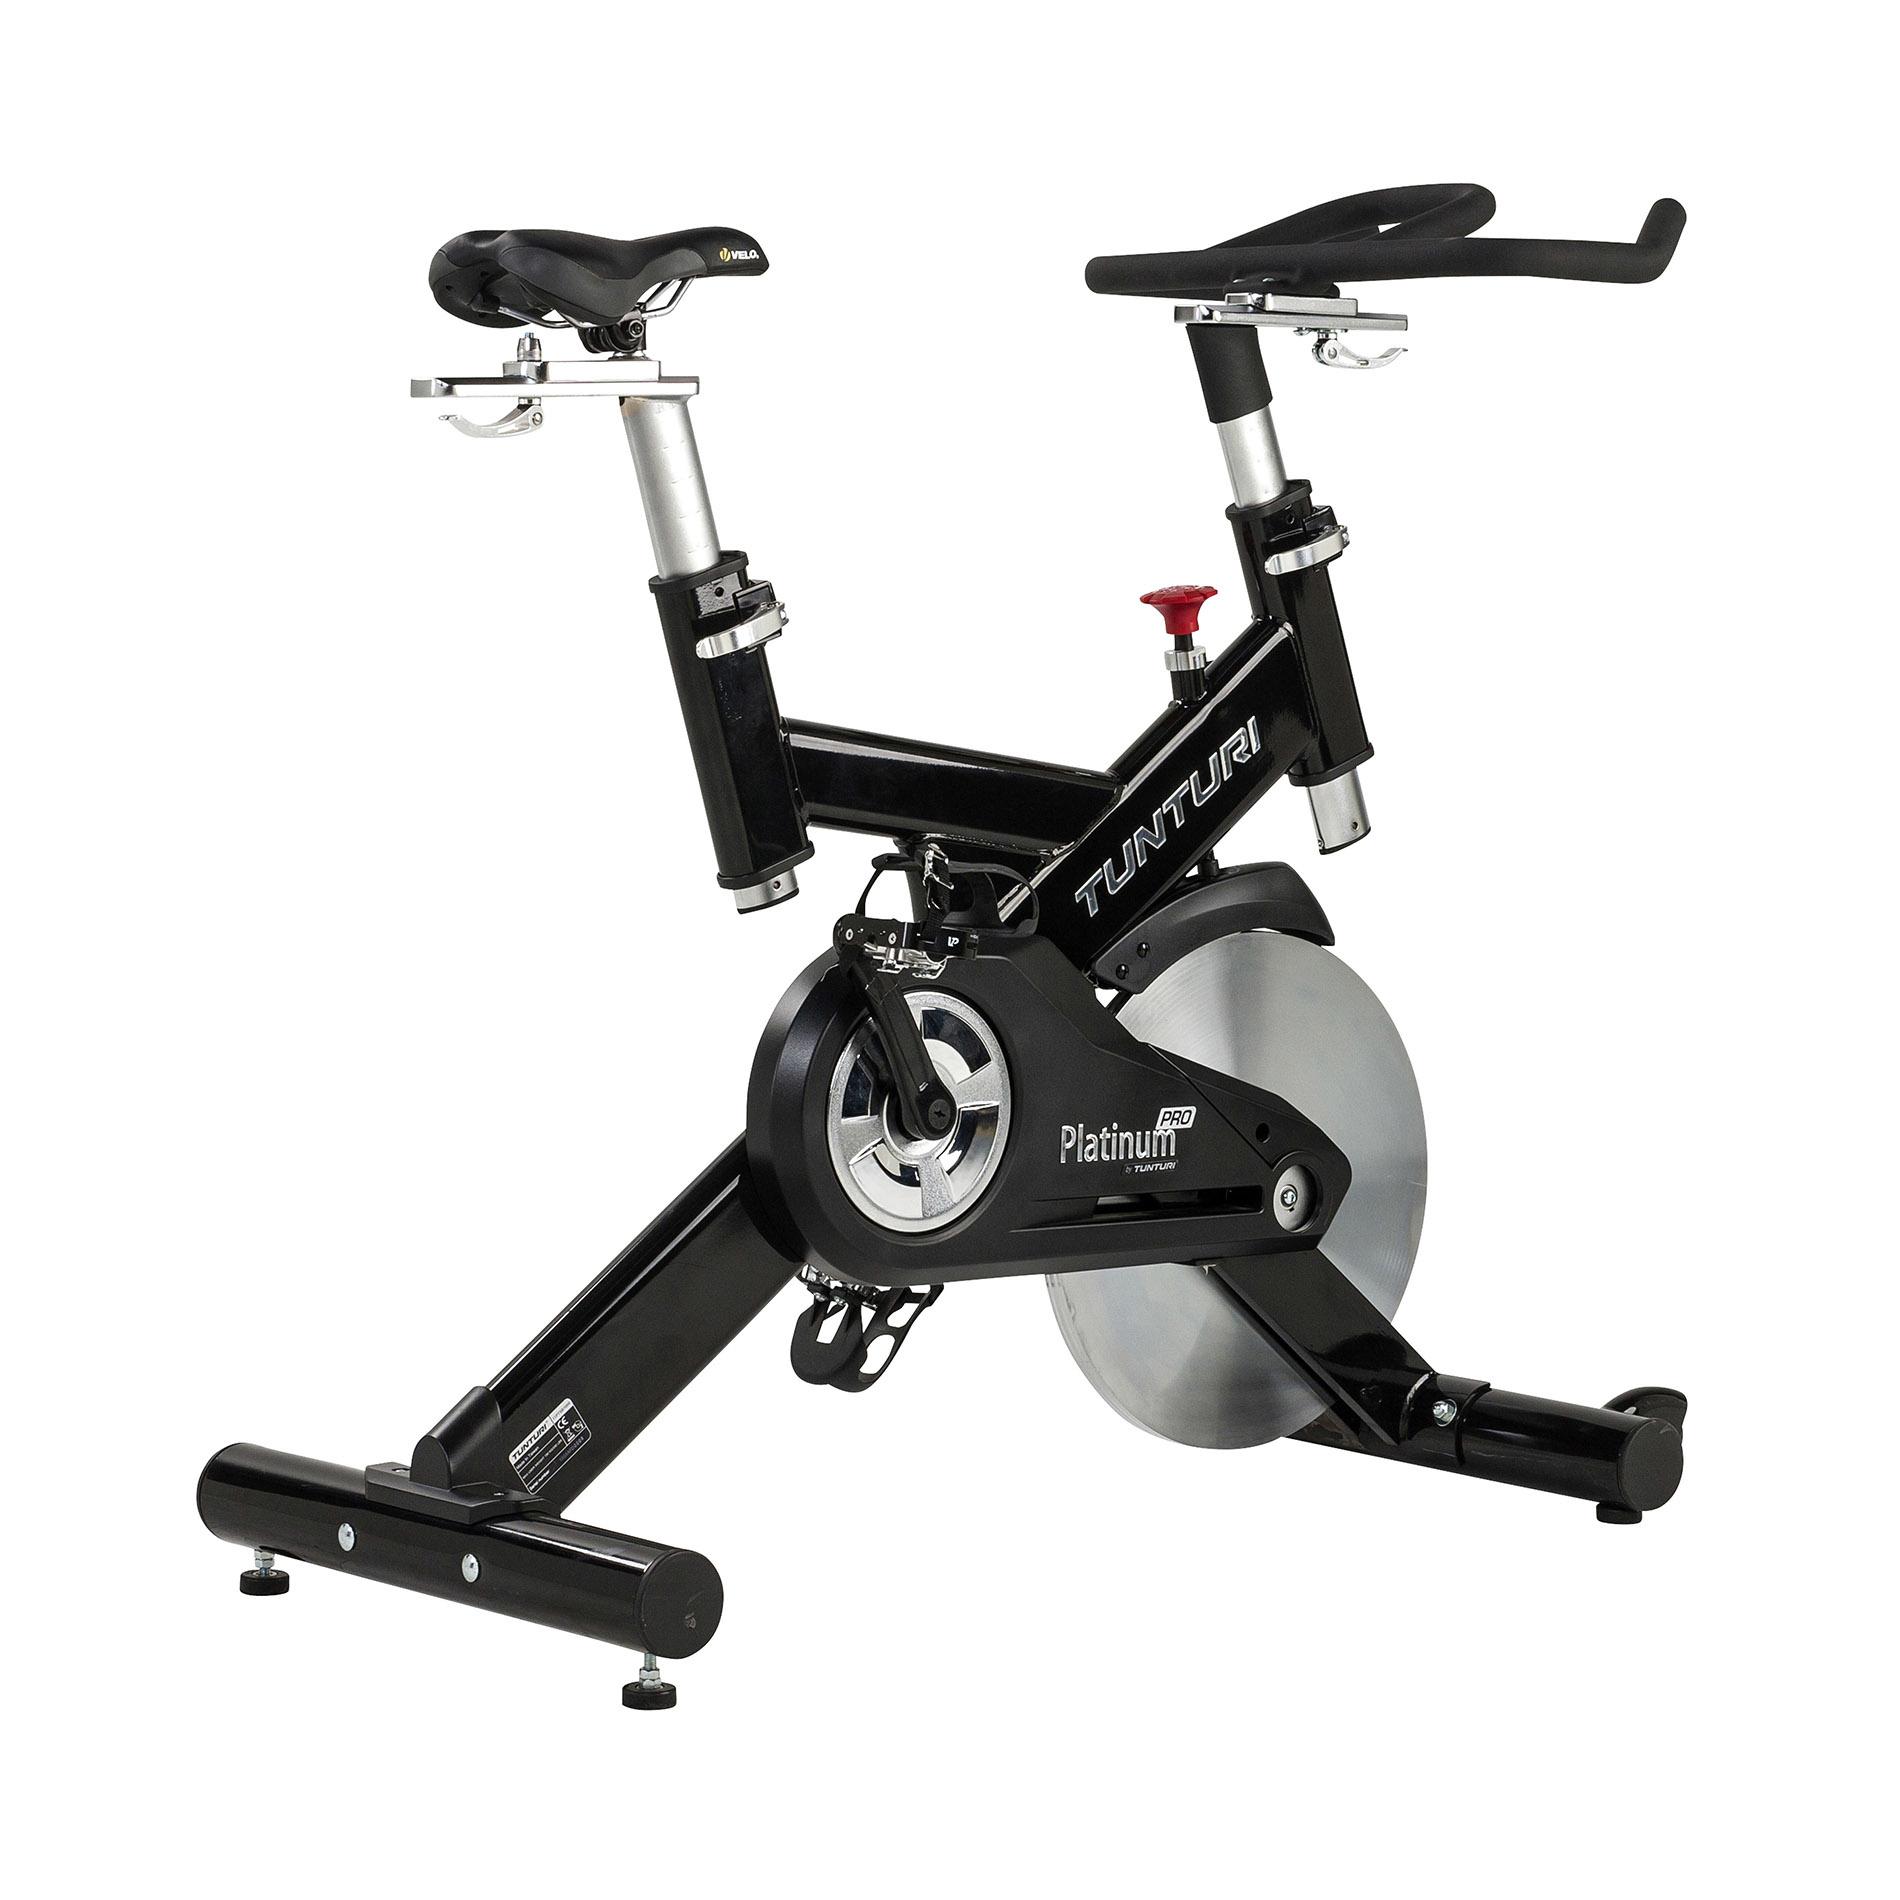 platinum-pro-sprinter-bike